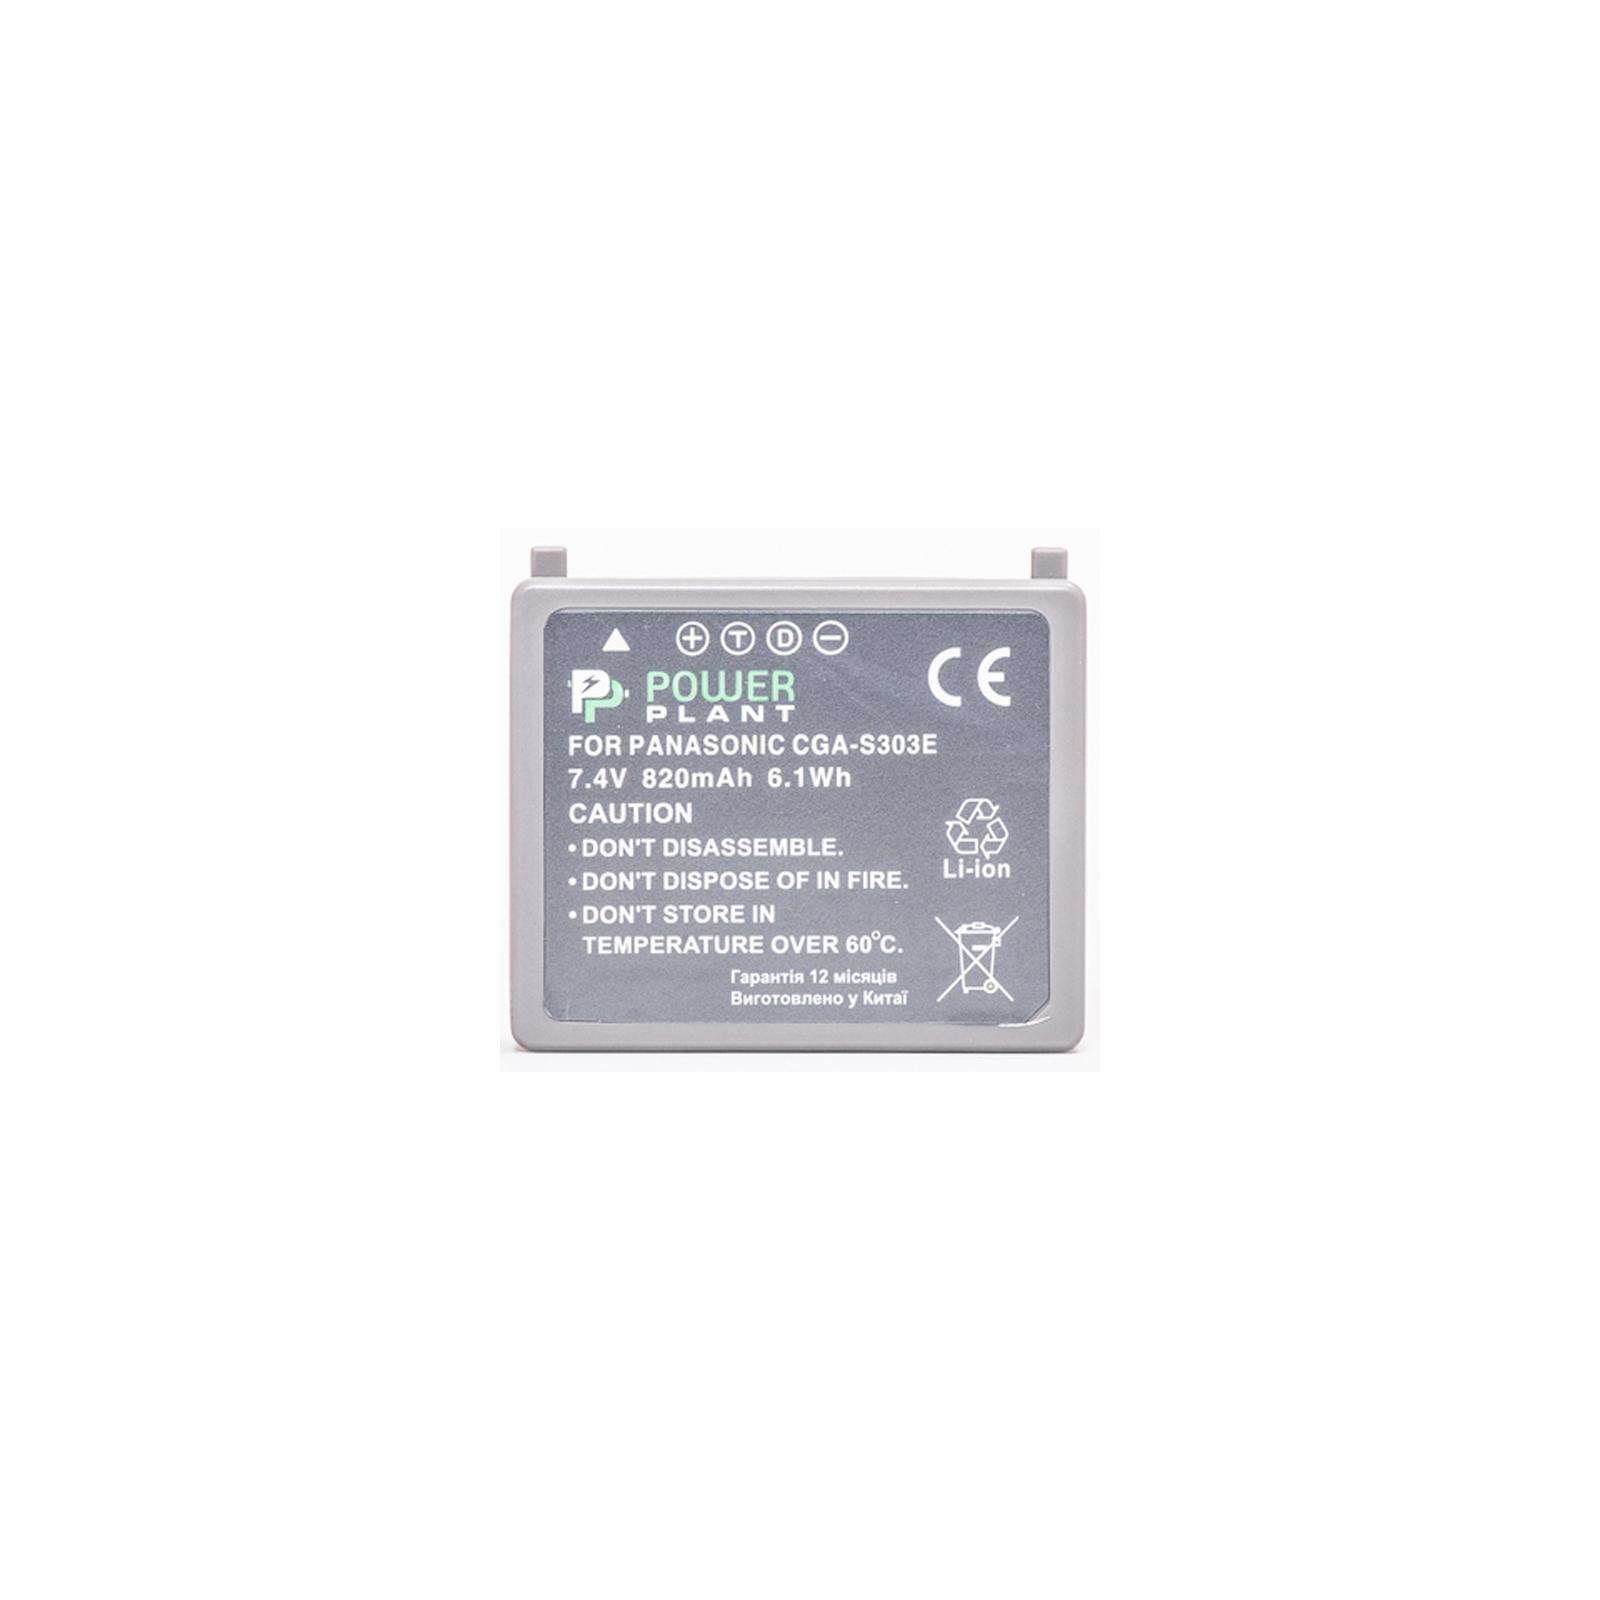 Аккумулятор к фото/видео PowerPlant Panasonic VW-VBE10, CGA-S303 (DV00DV1341) изображение 2